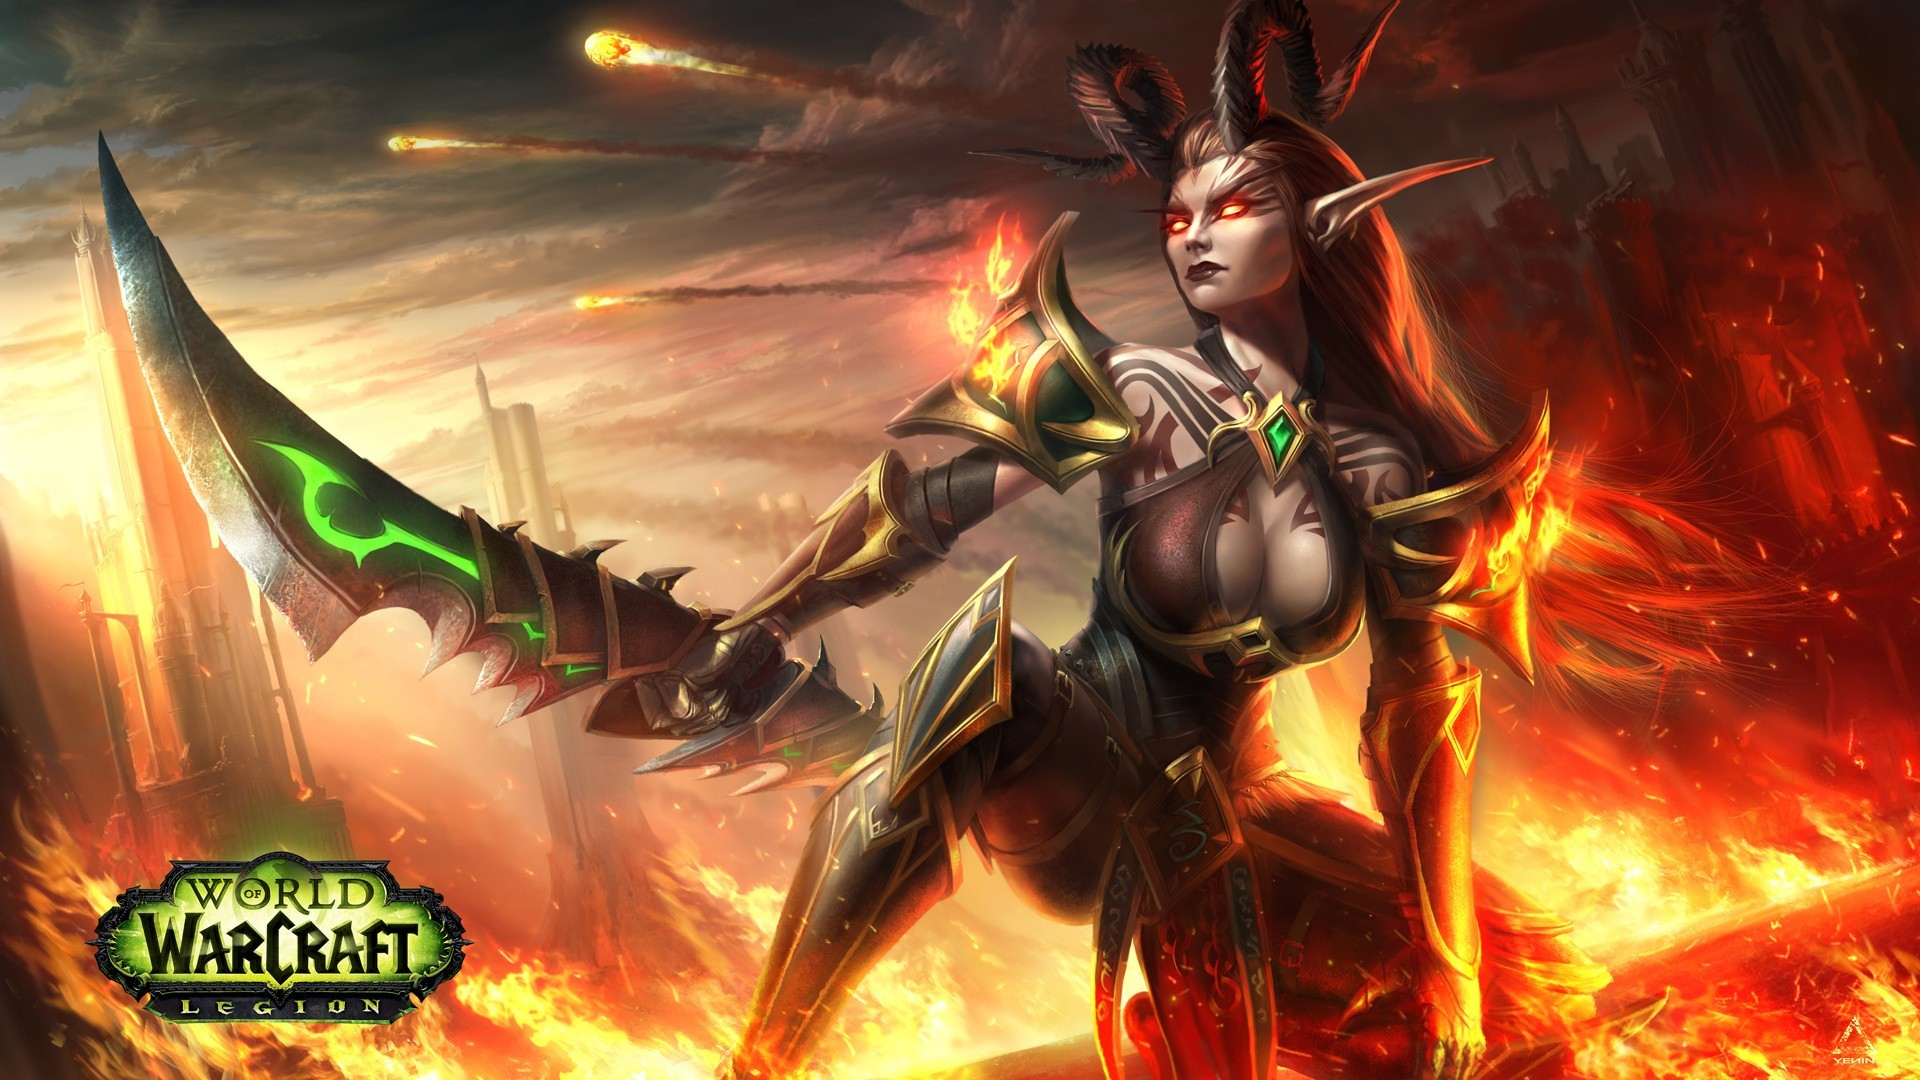 Demon Hunter, World of Warcraft, World of Warcraft: Legion, Fantasy girl,  Video games Wallpapers HD / Desktop and Mobile Backgrounds